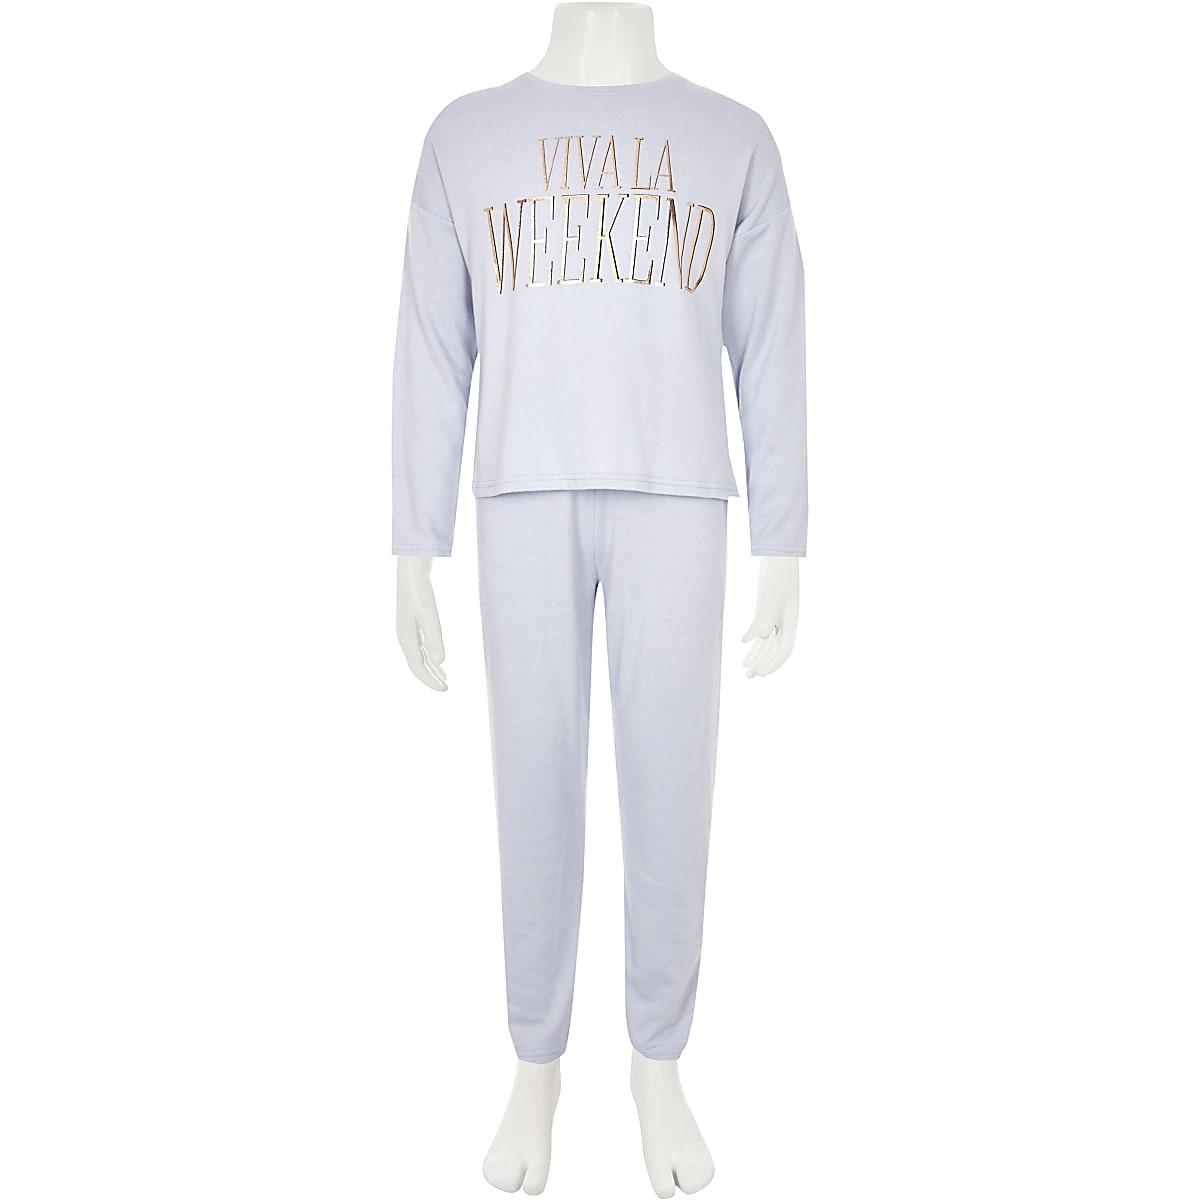 44638763f Girls blue 'Viva la weekend' pyjama set - Pyjamas & Underwear - girls